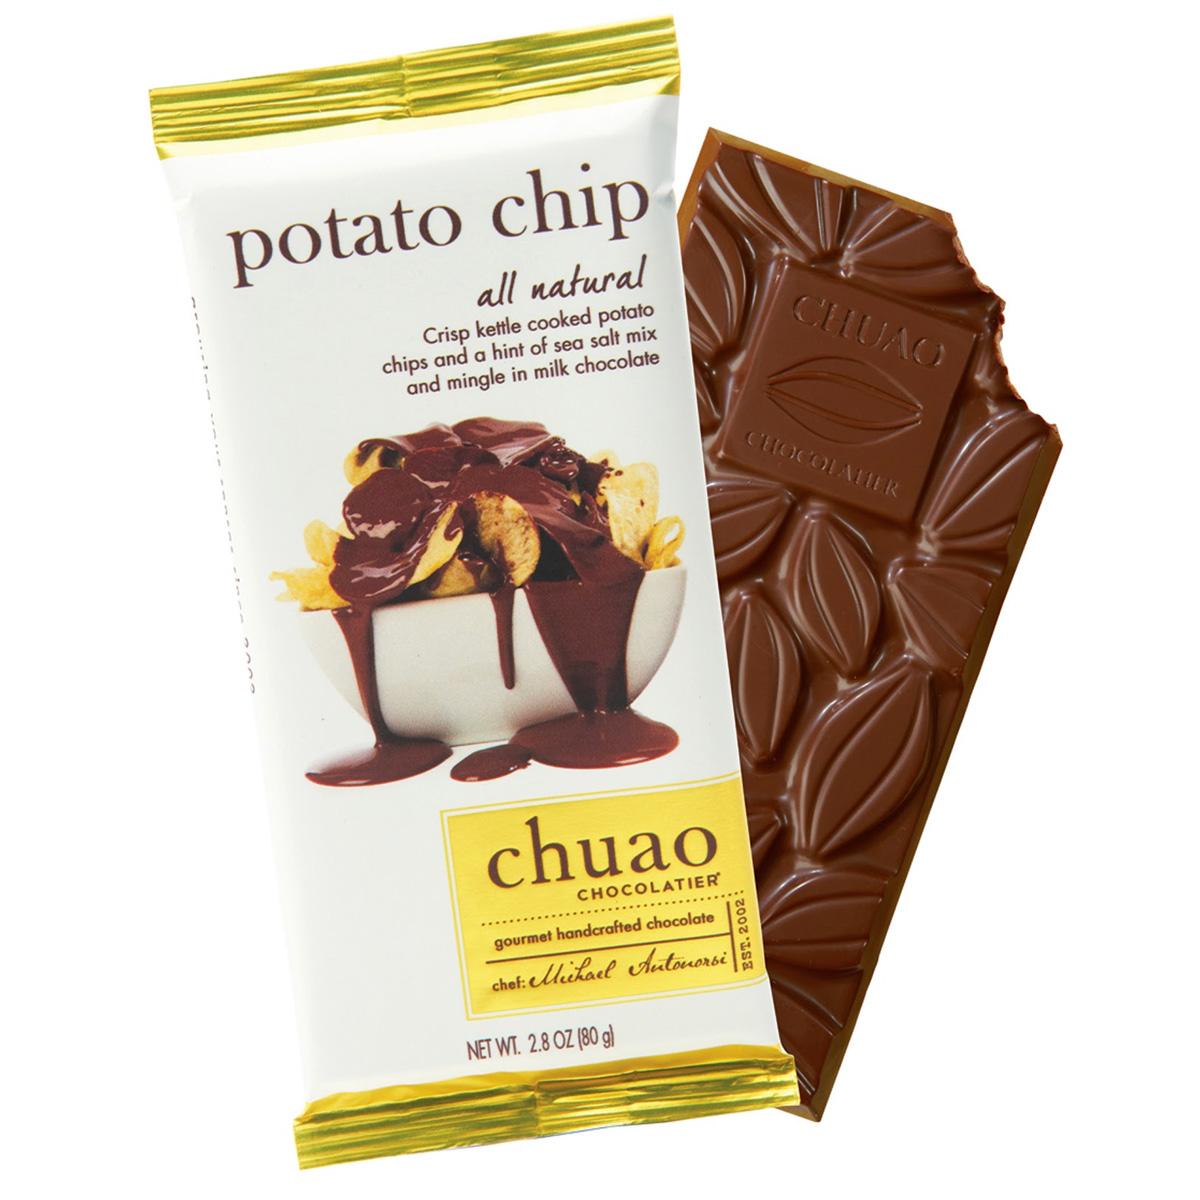 Chuao Potato Chip Chocolate Bar - The Green Head